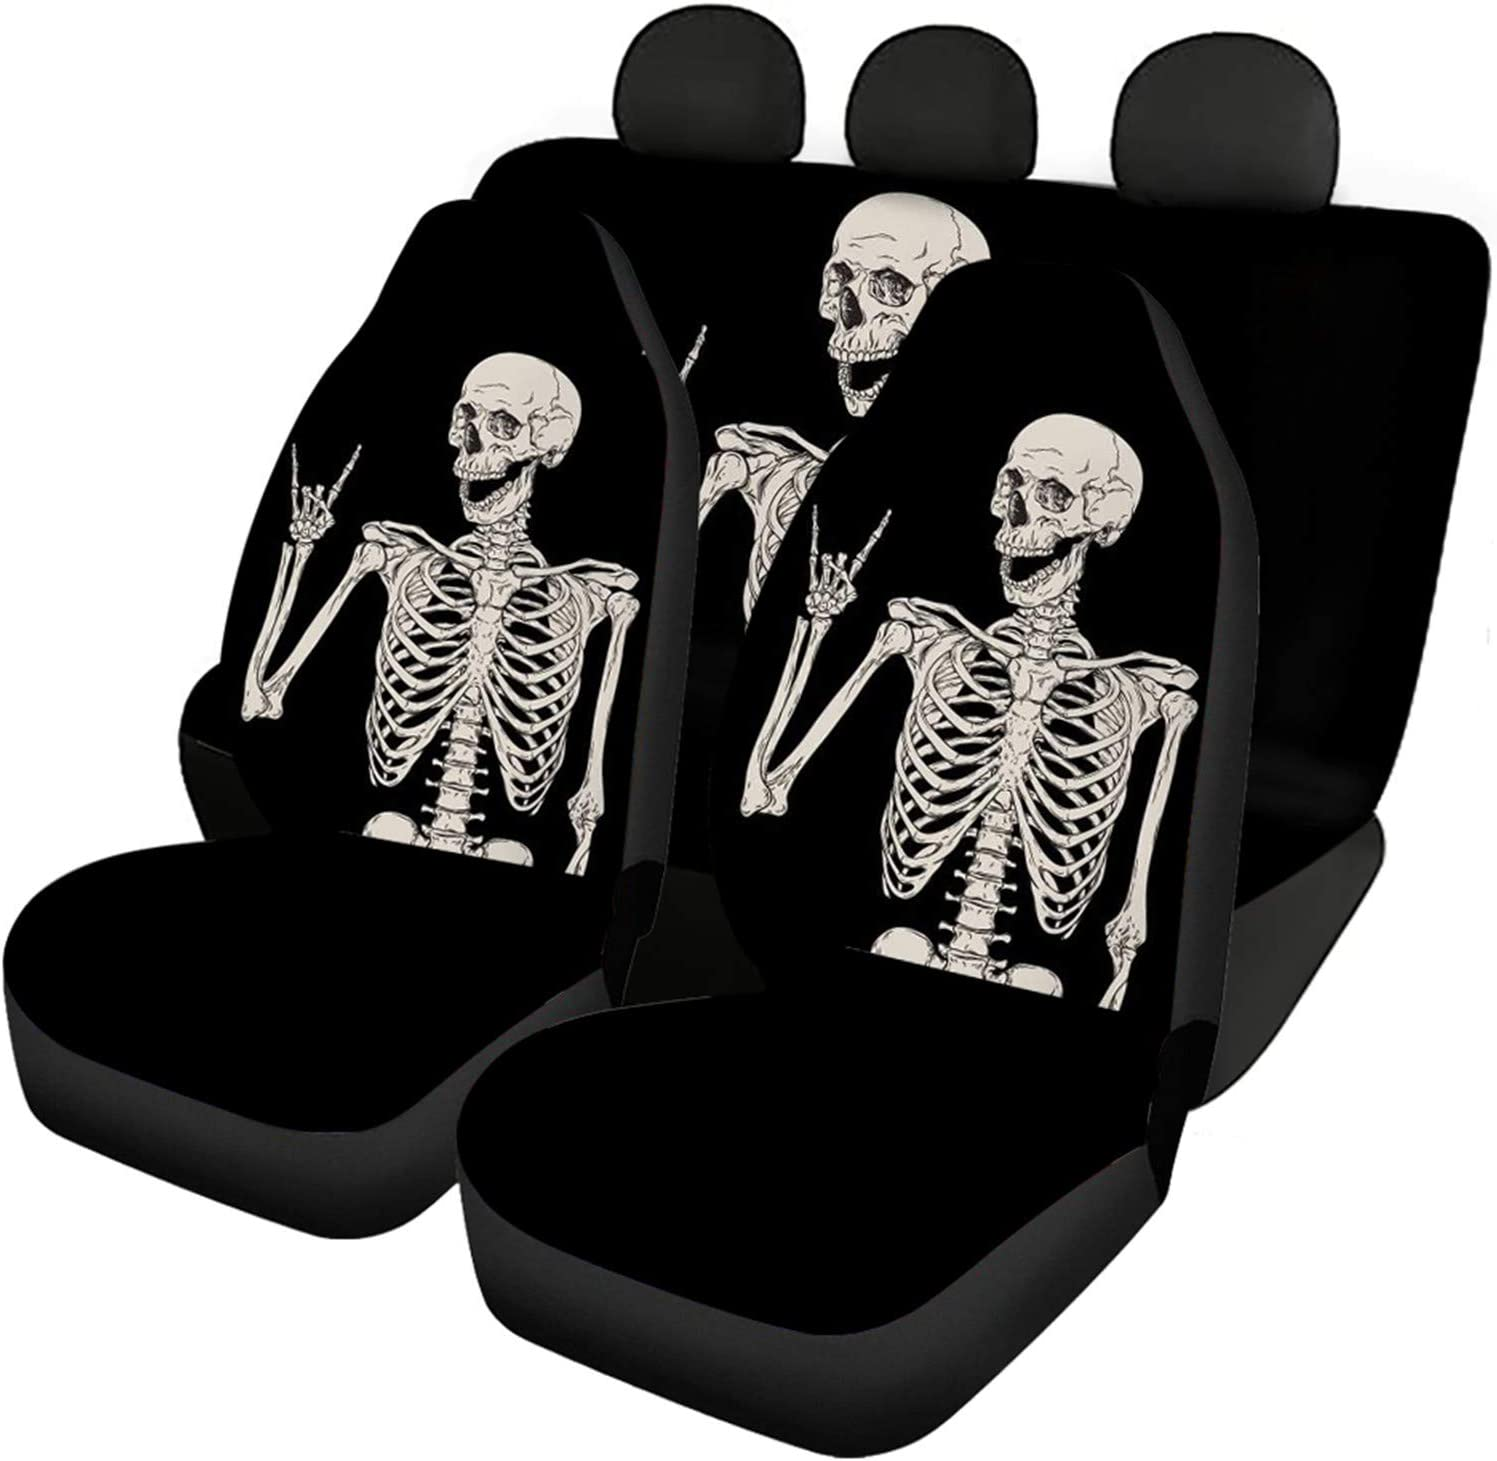 Belidome Skeleton Skull Seat Covers Elegant Vehicles Arlington Mall for Protector I Car